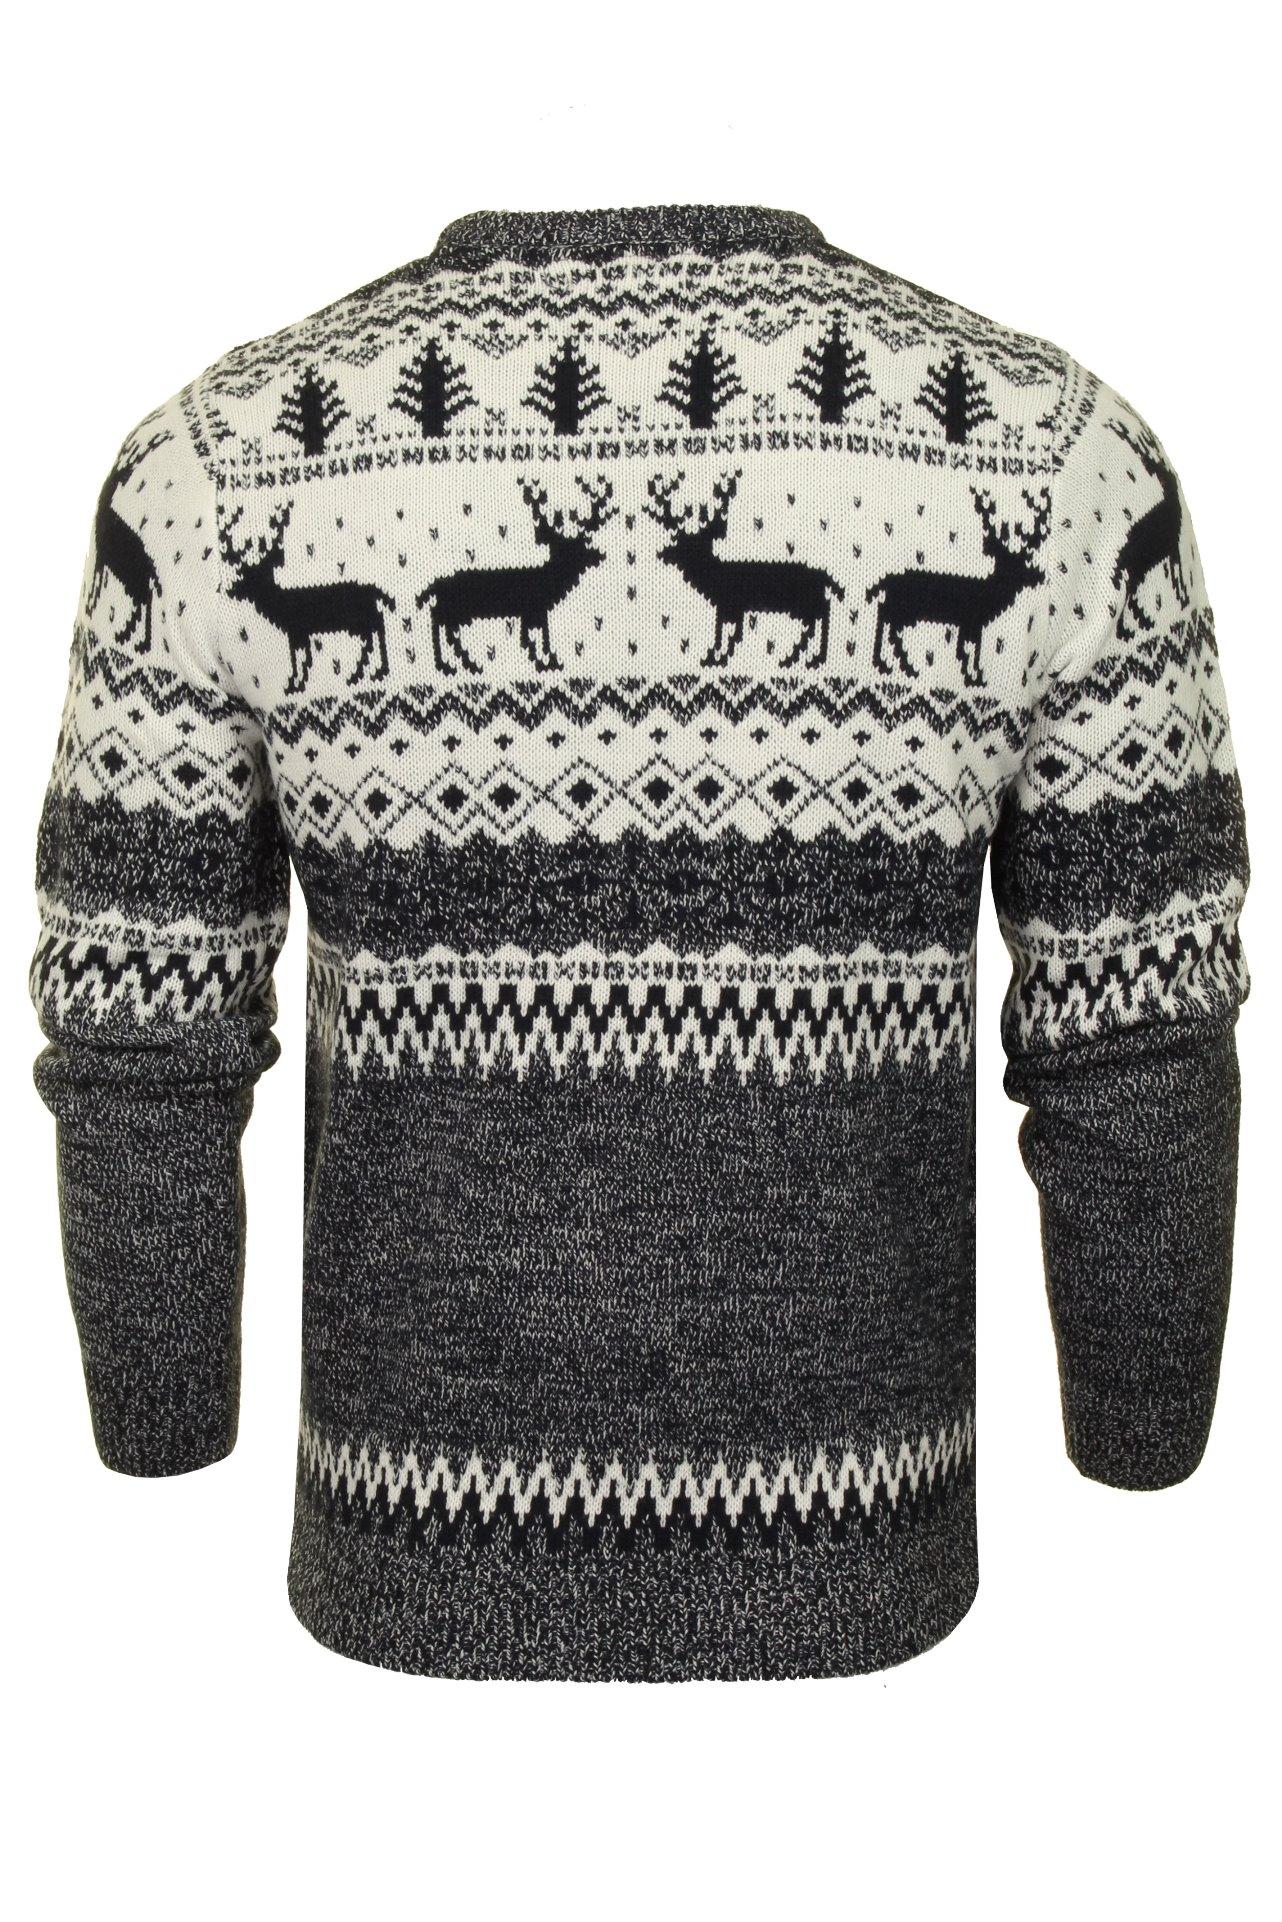 Mens-Xact-Christmas-Xmas-Jumper-039-Reindeer-Fairisle-Crew-039 thumbnail 5